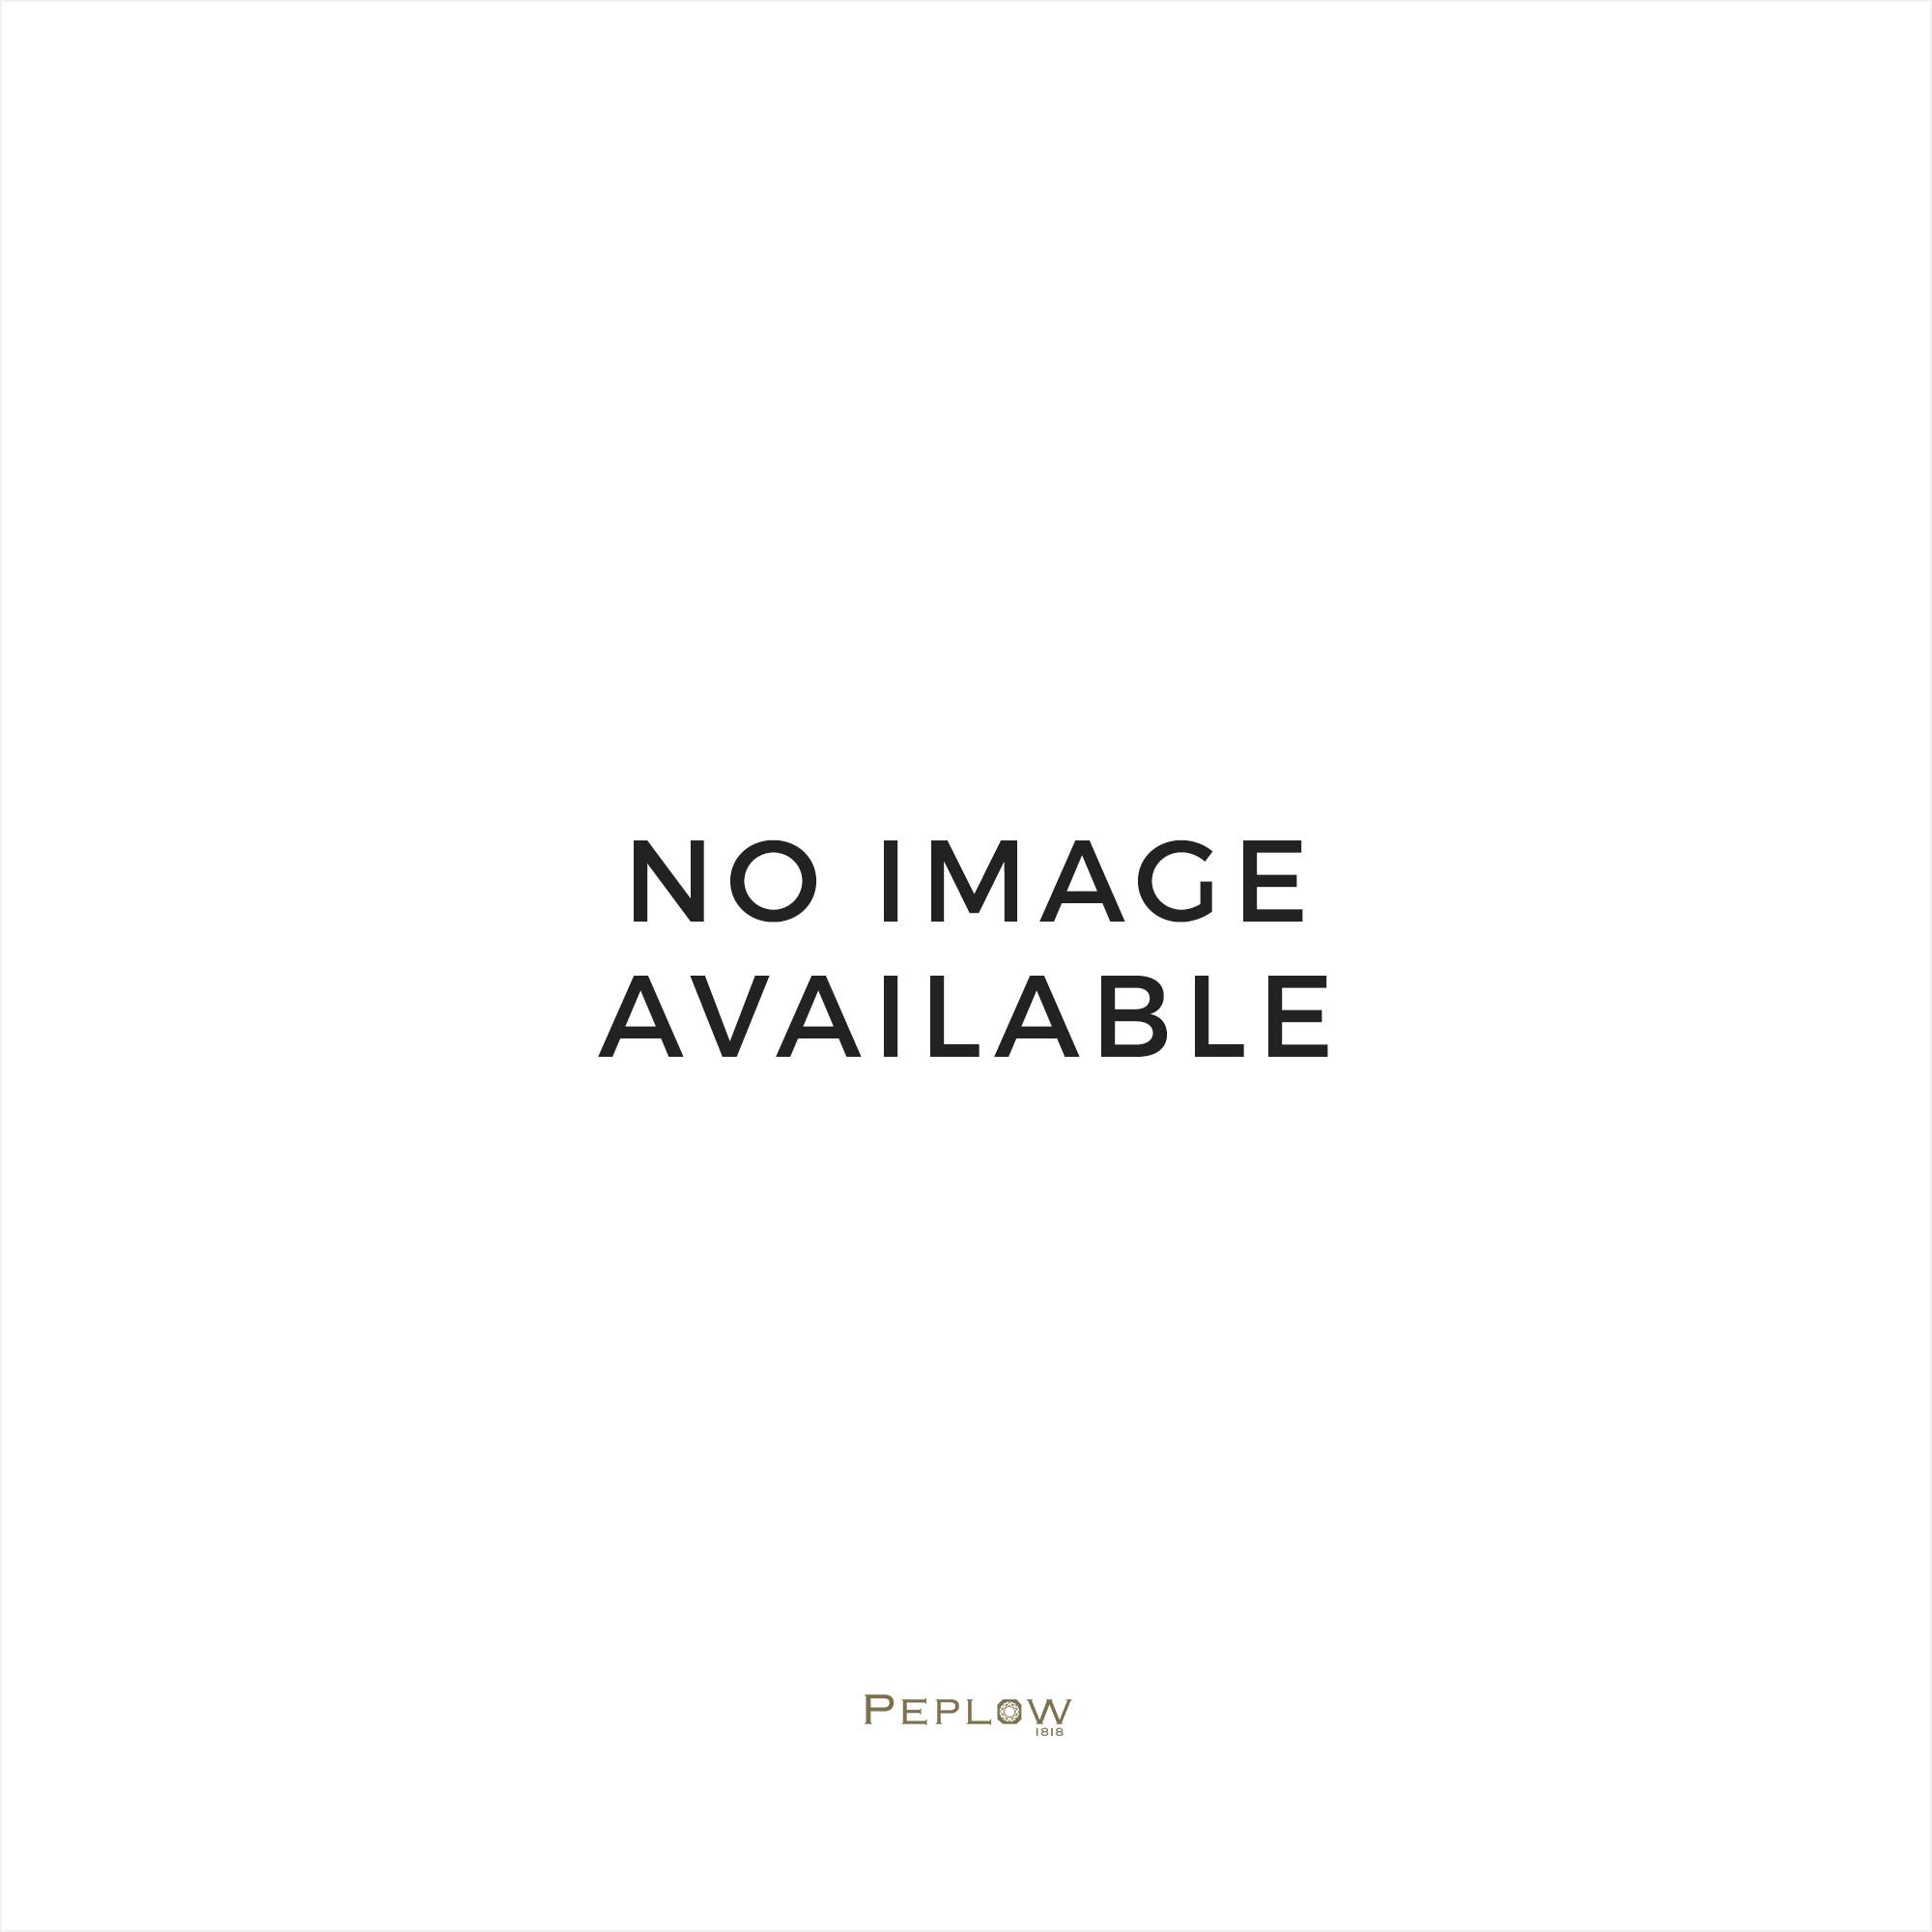 Effervescence star sterling silver bracelet 5010.1399